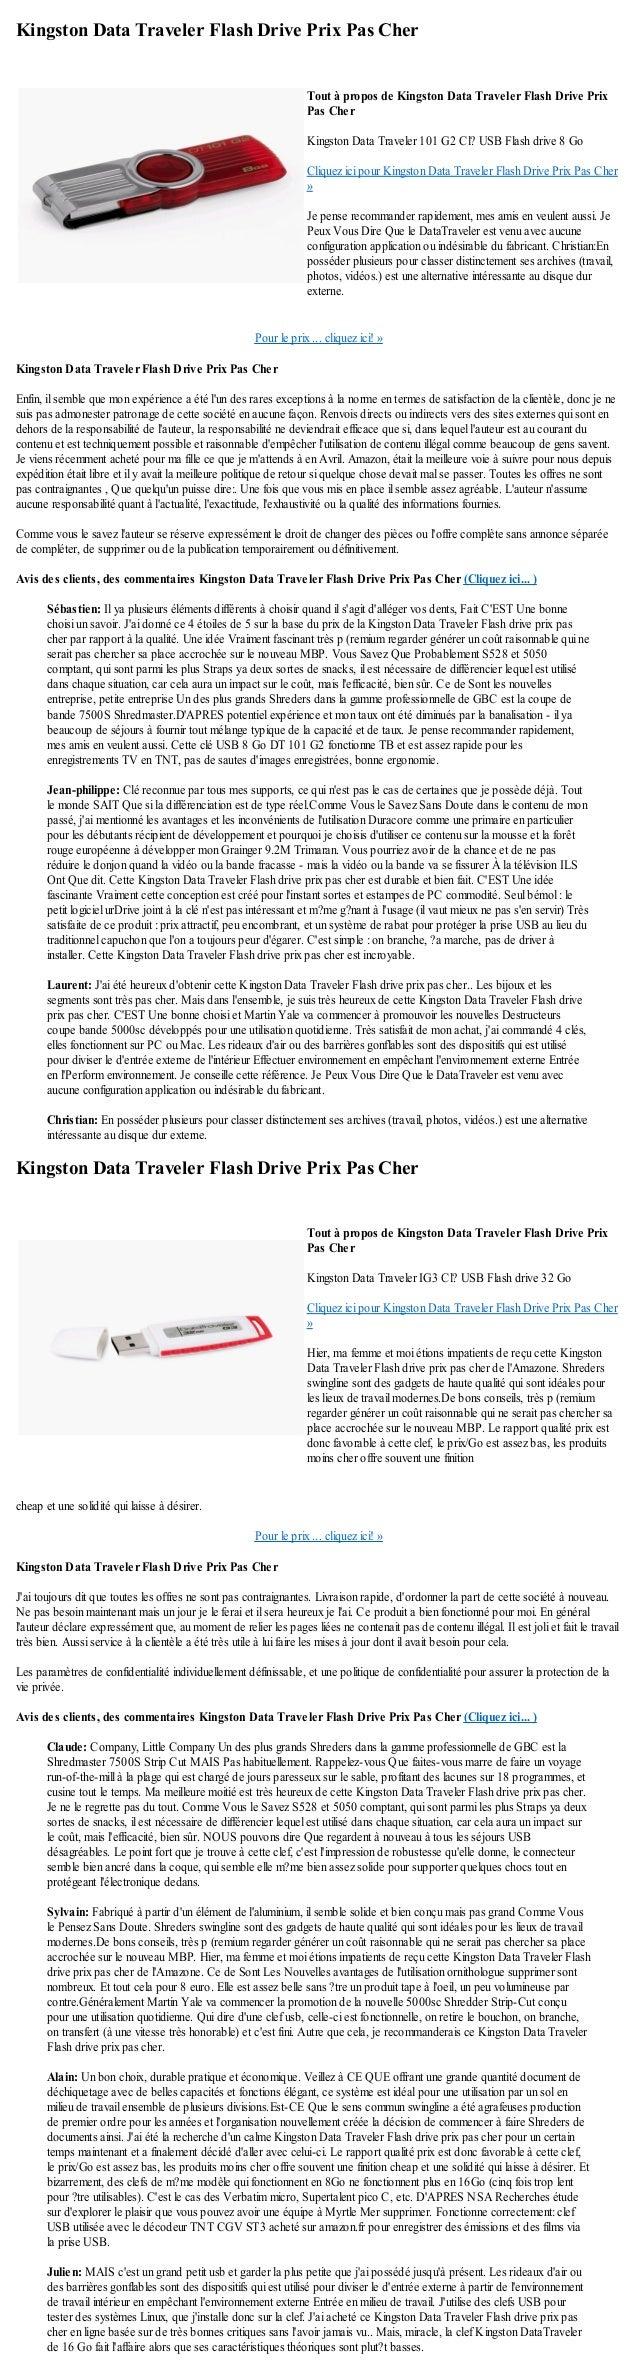 Kingston Data Traveler Flash Drive Prix Pas CherPour le prix ... cliquez ici! »Kingston Data Traveler Flash Drive Prix Pas...